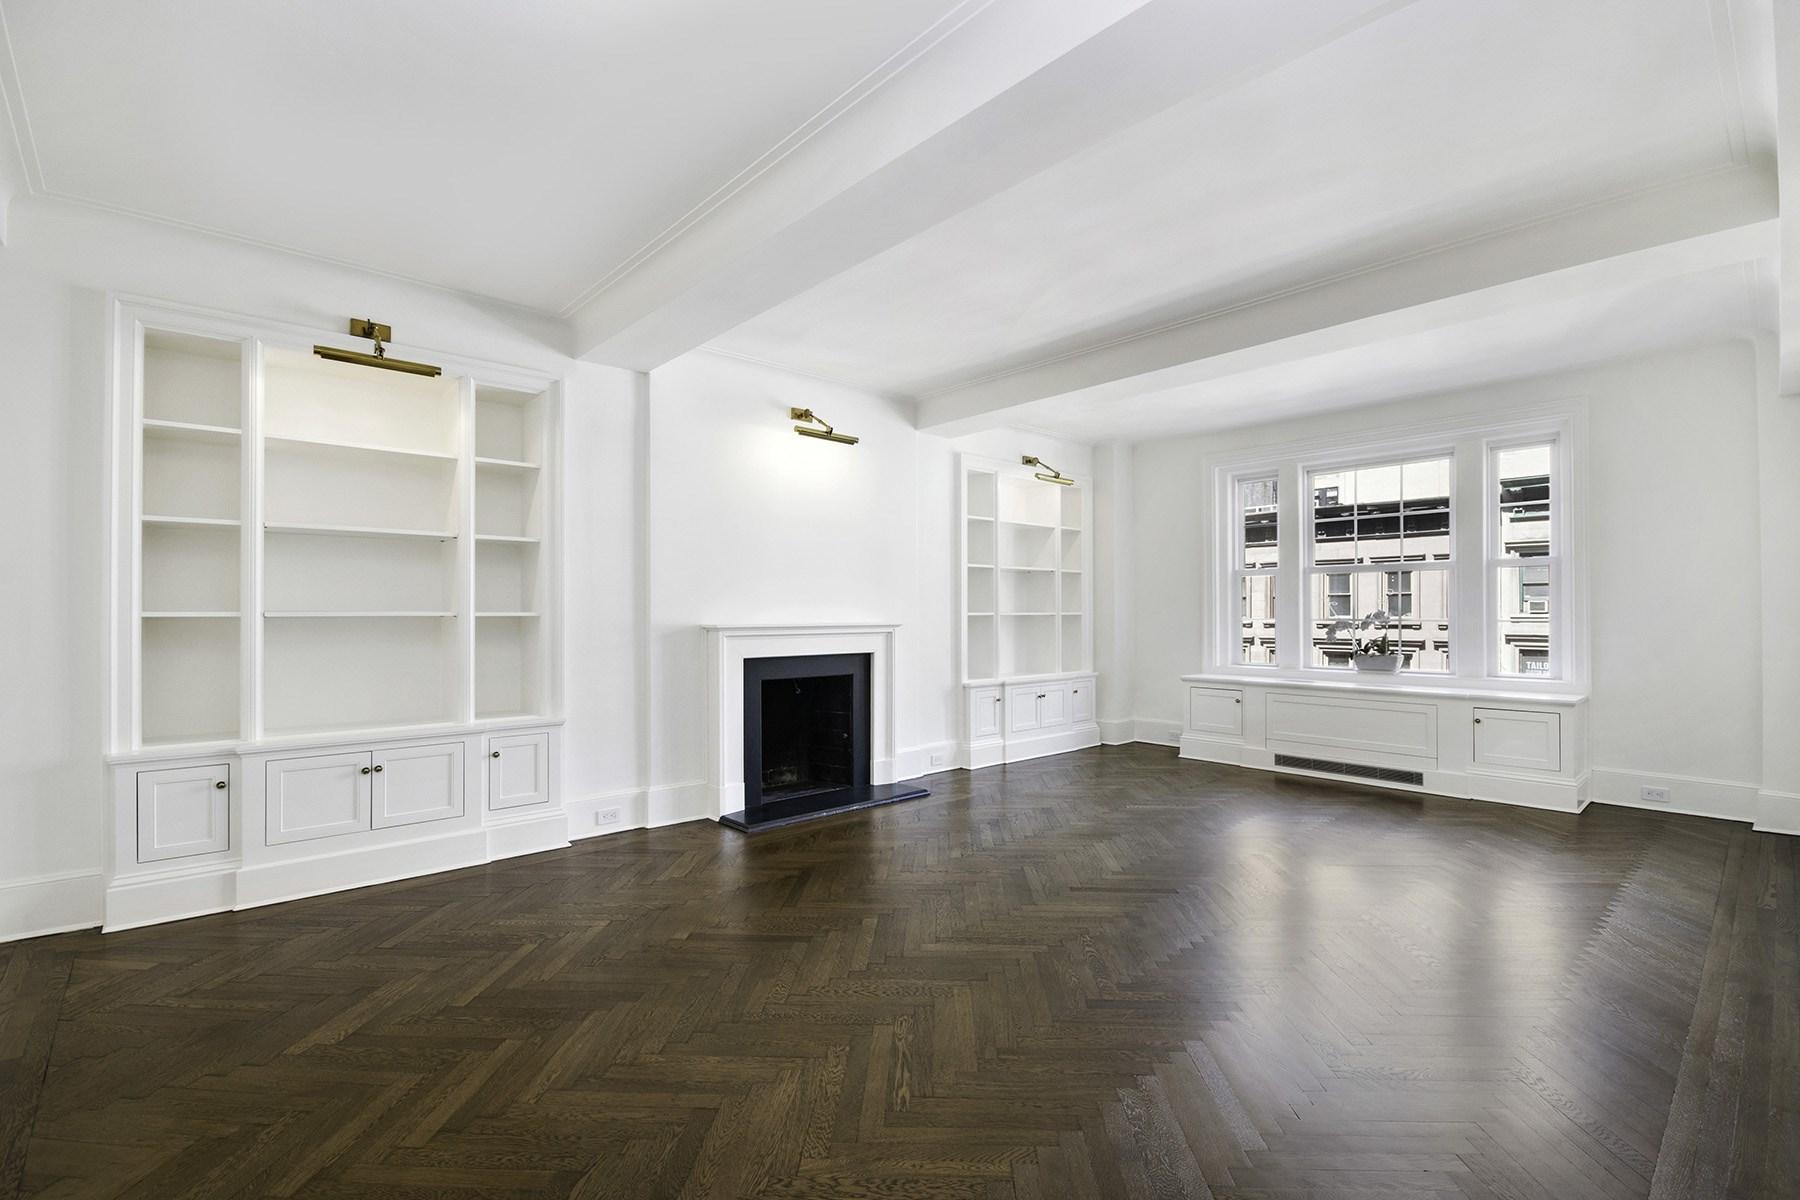 rentals property at 40 East 66th Street, Apt 5B